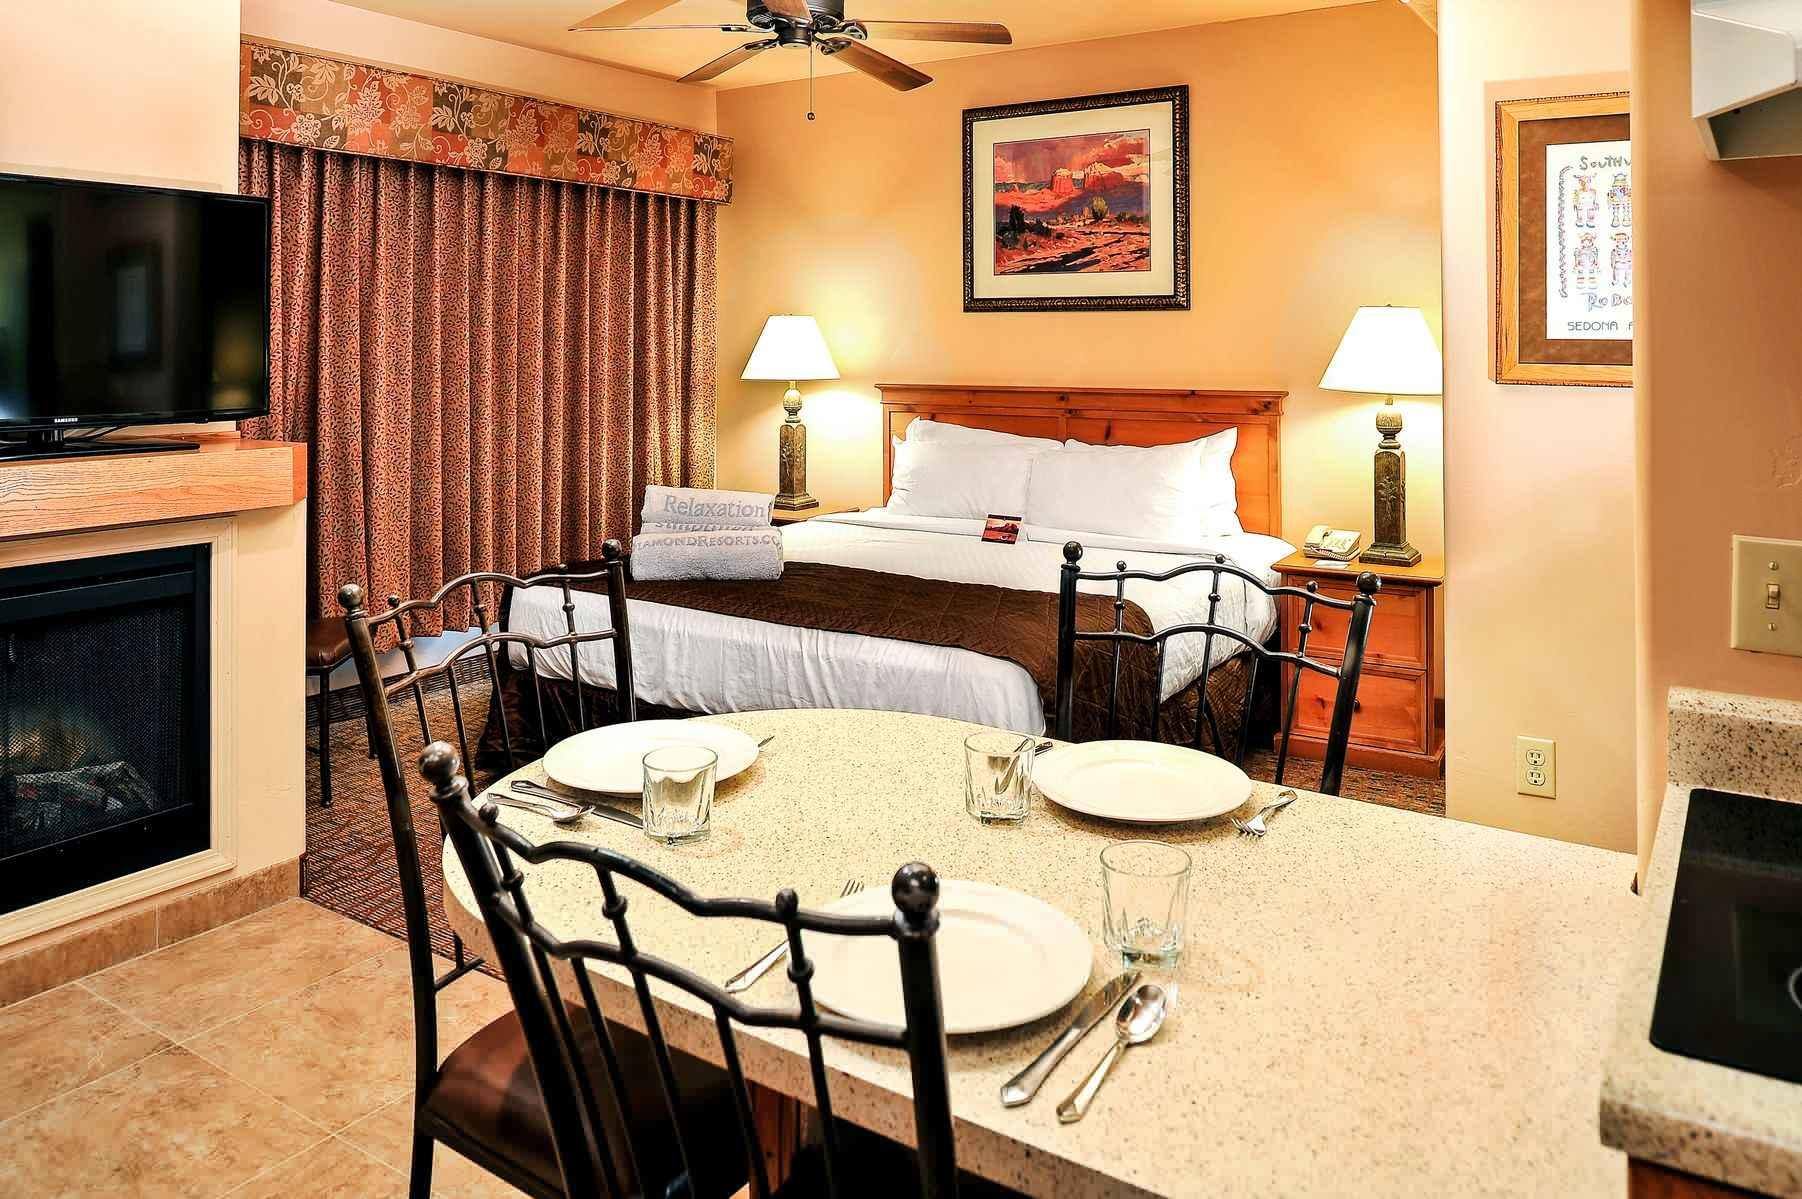 Bell Rock Inn Suites